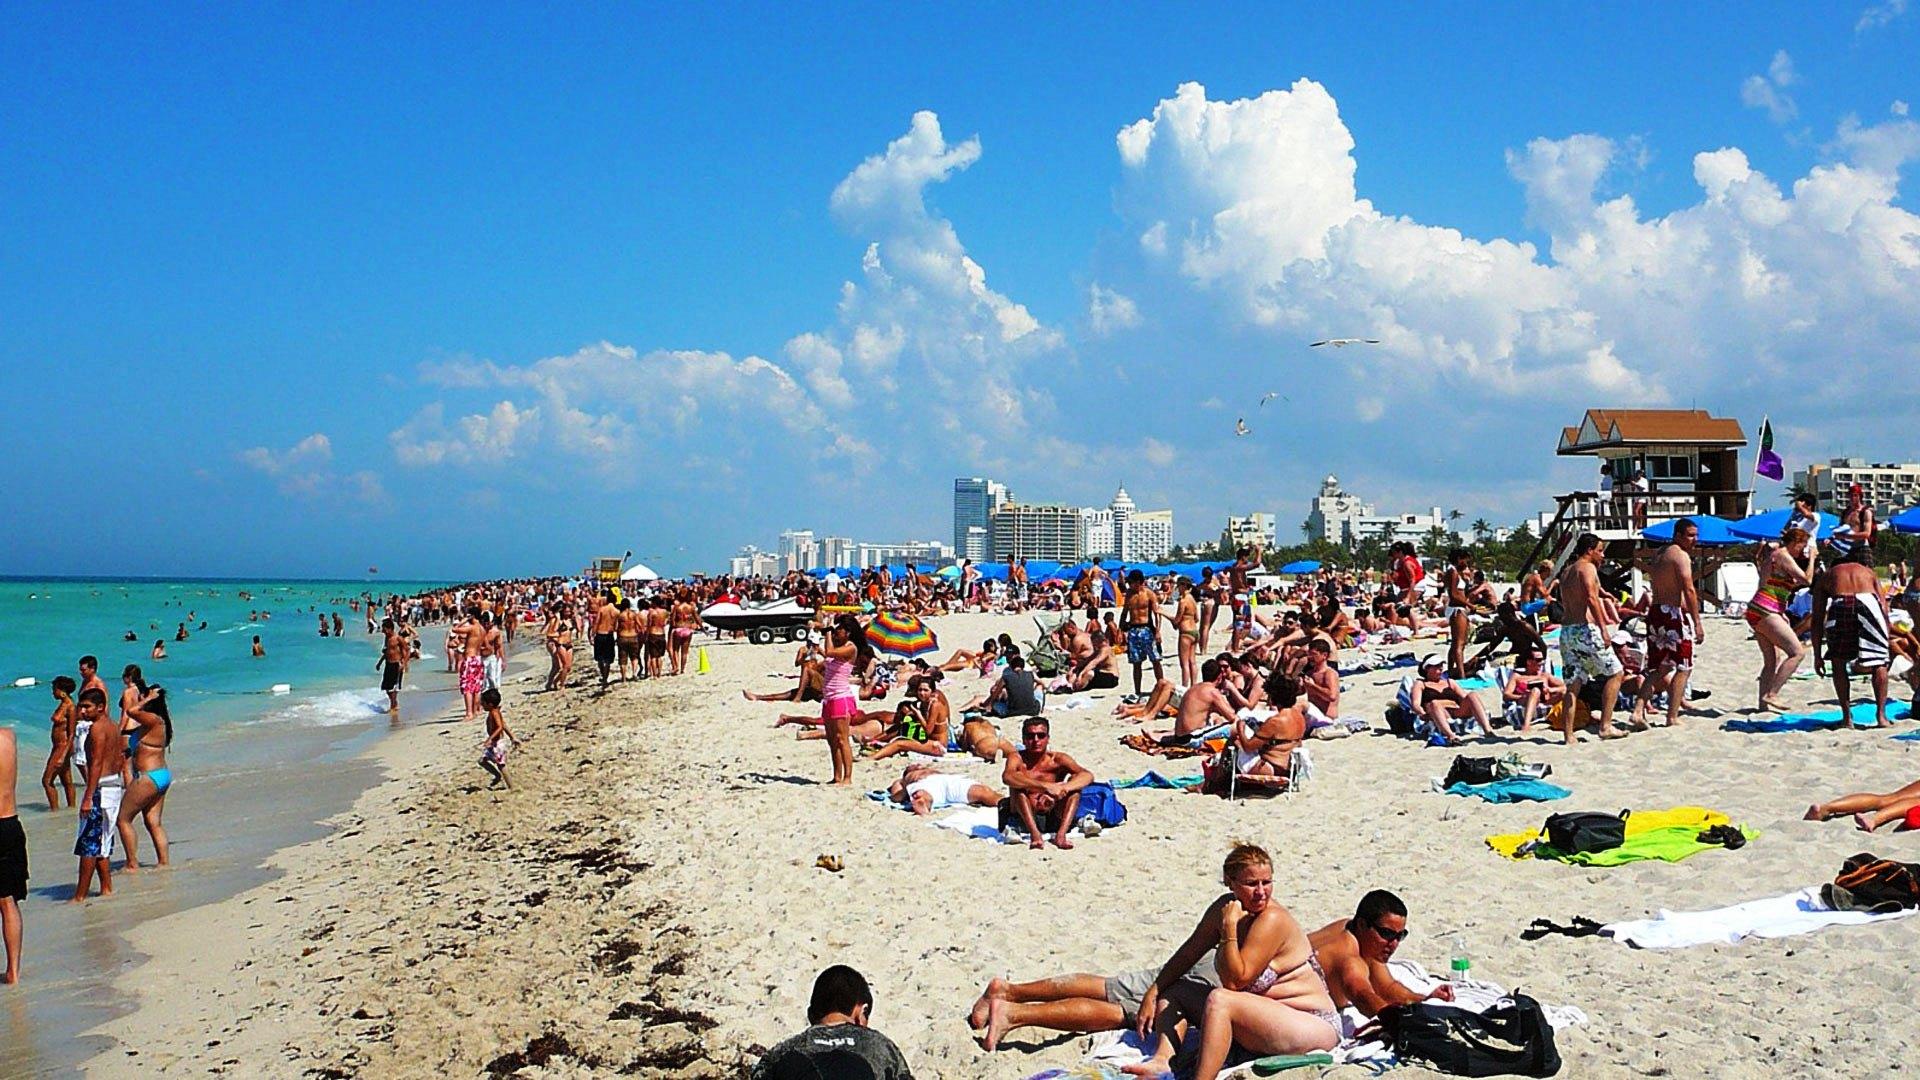 Miami Beach Florida USA HD Wallpaper Miami Beach Florida USA 1920x1080